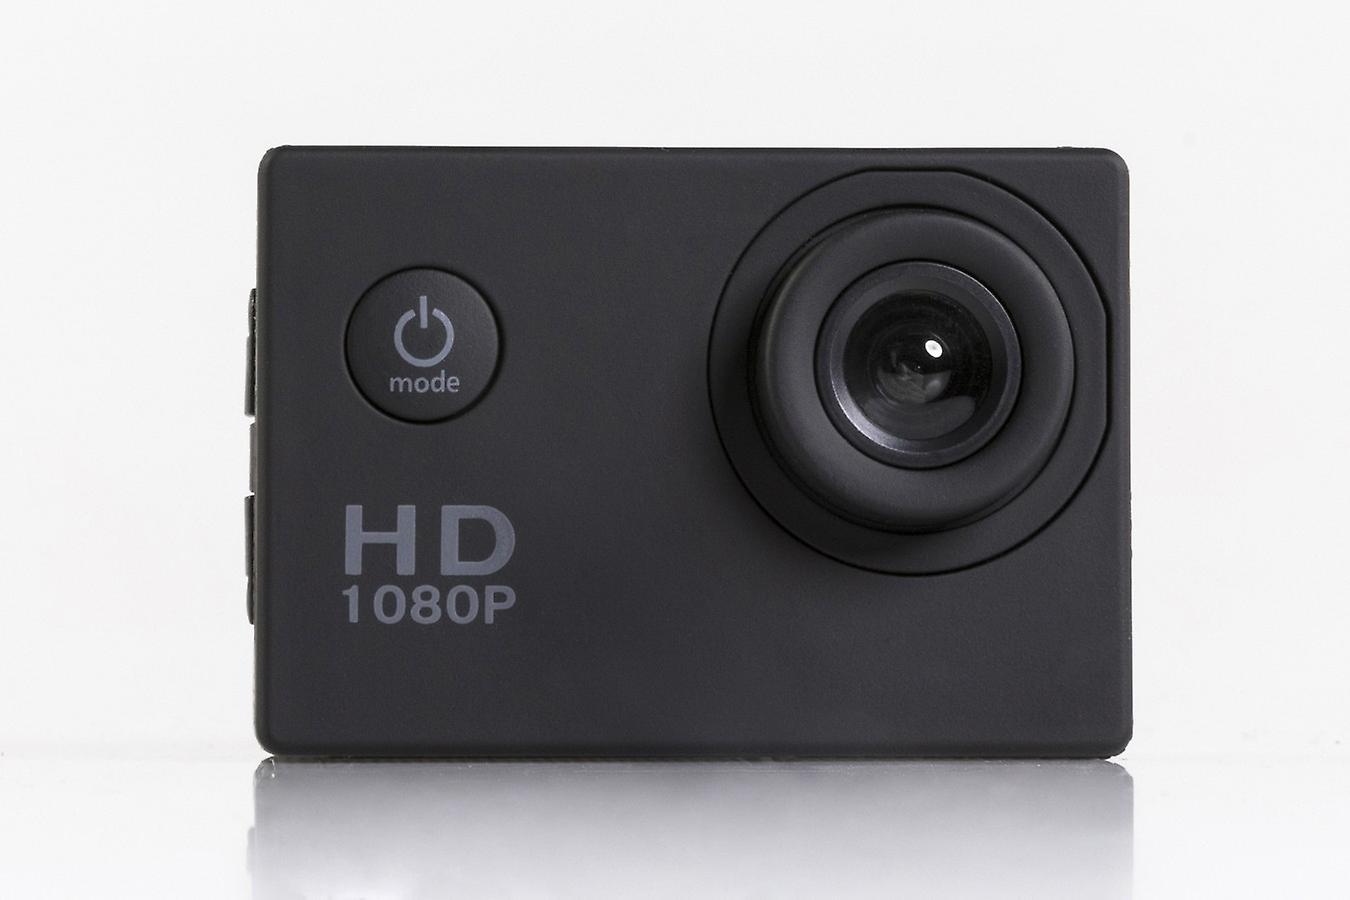 TECHNOSMART Full HD 1080P ActionCam, Waterproof Action Camera, Underwater Camera, Sport Action Camera, with 2 inch LCD Screen, 900 mAh Li-ion Battery with Accessories Kits